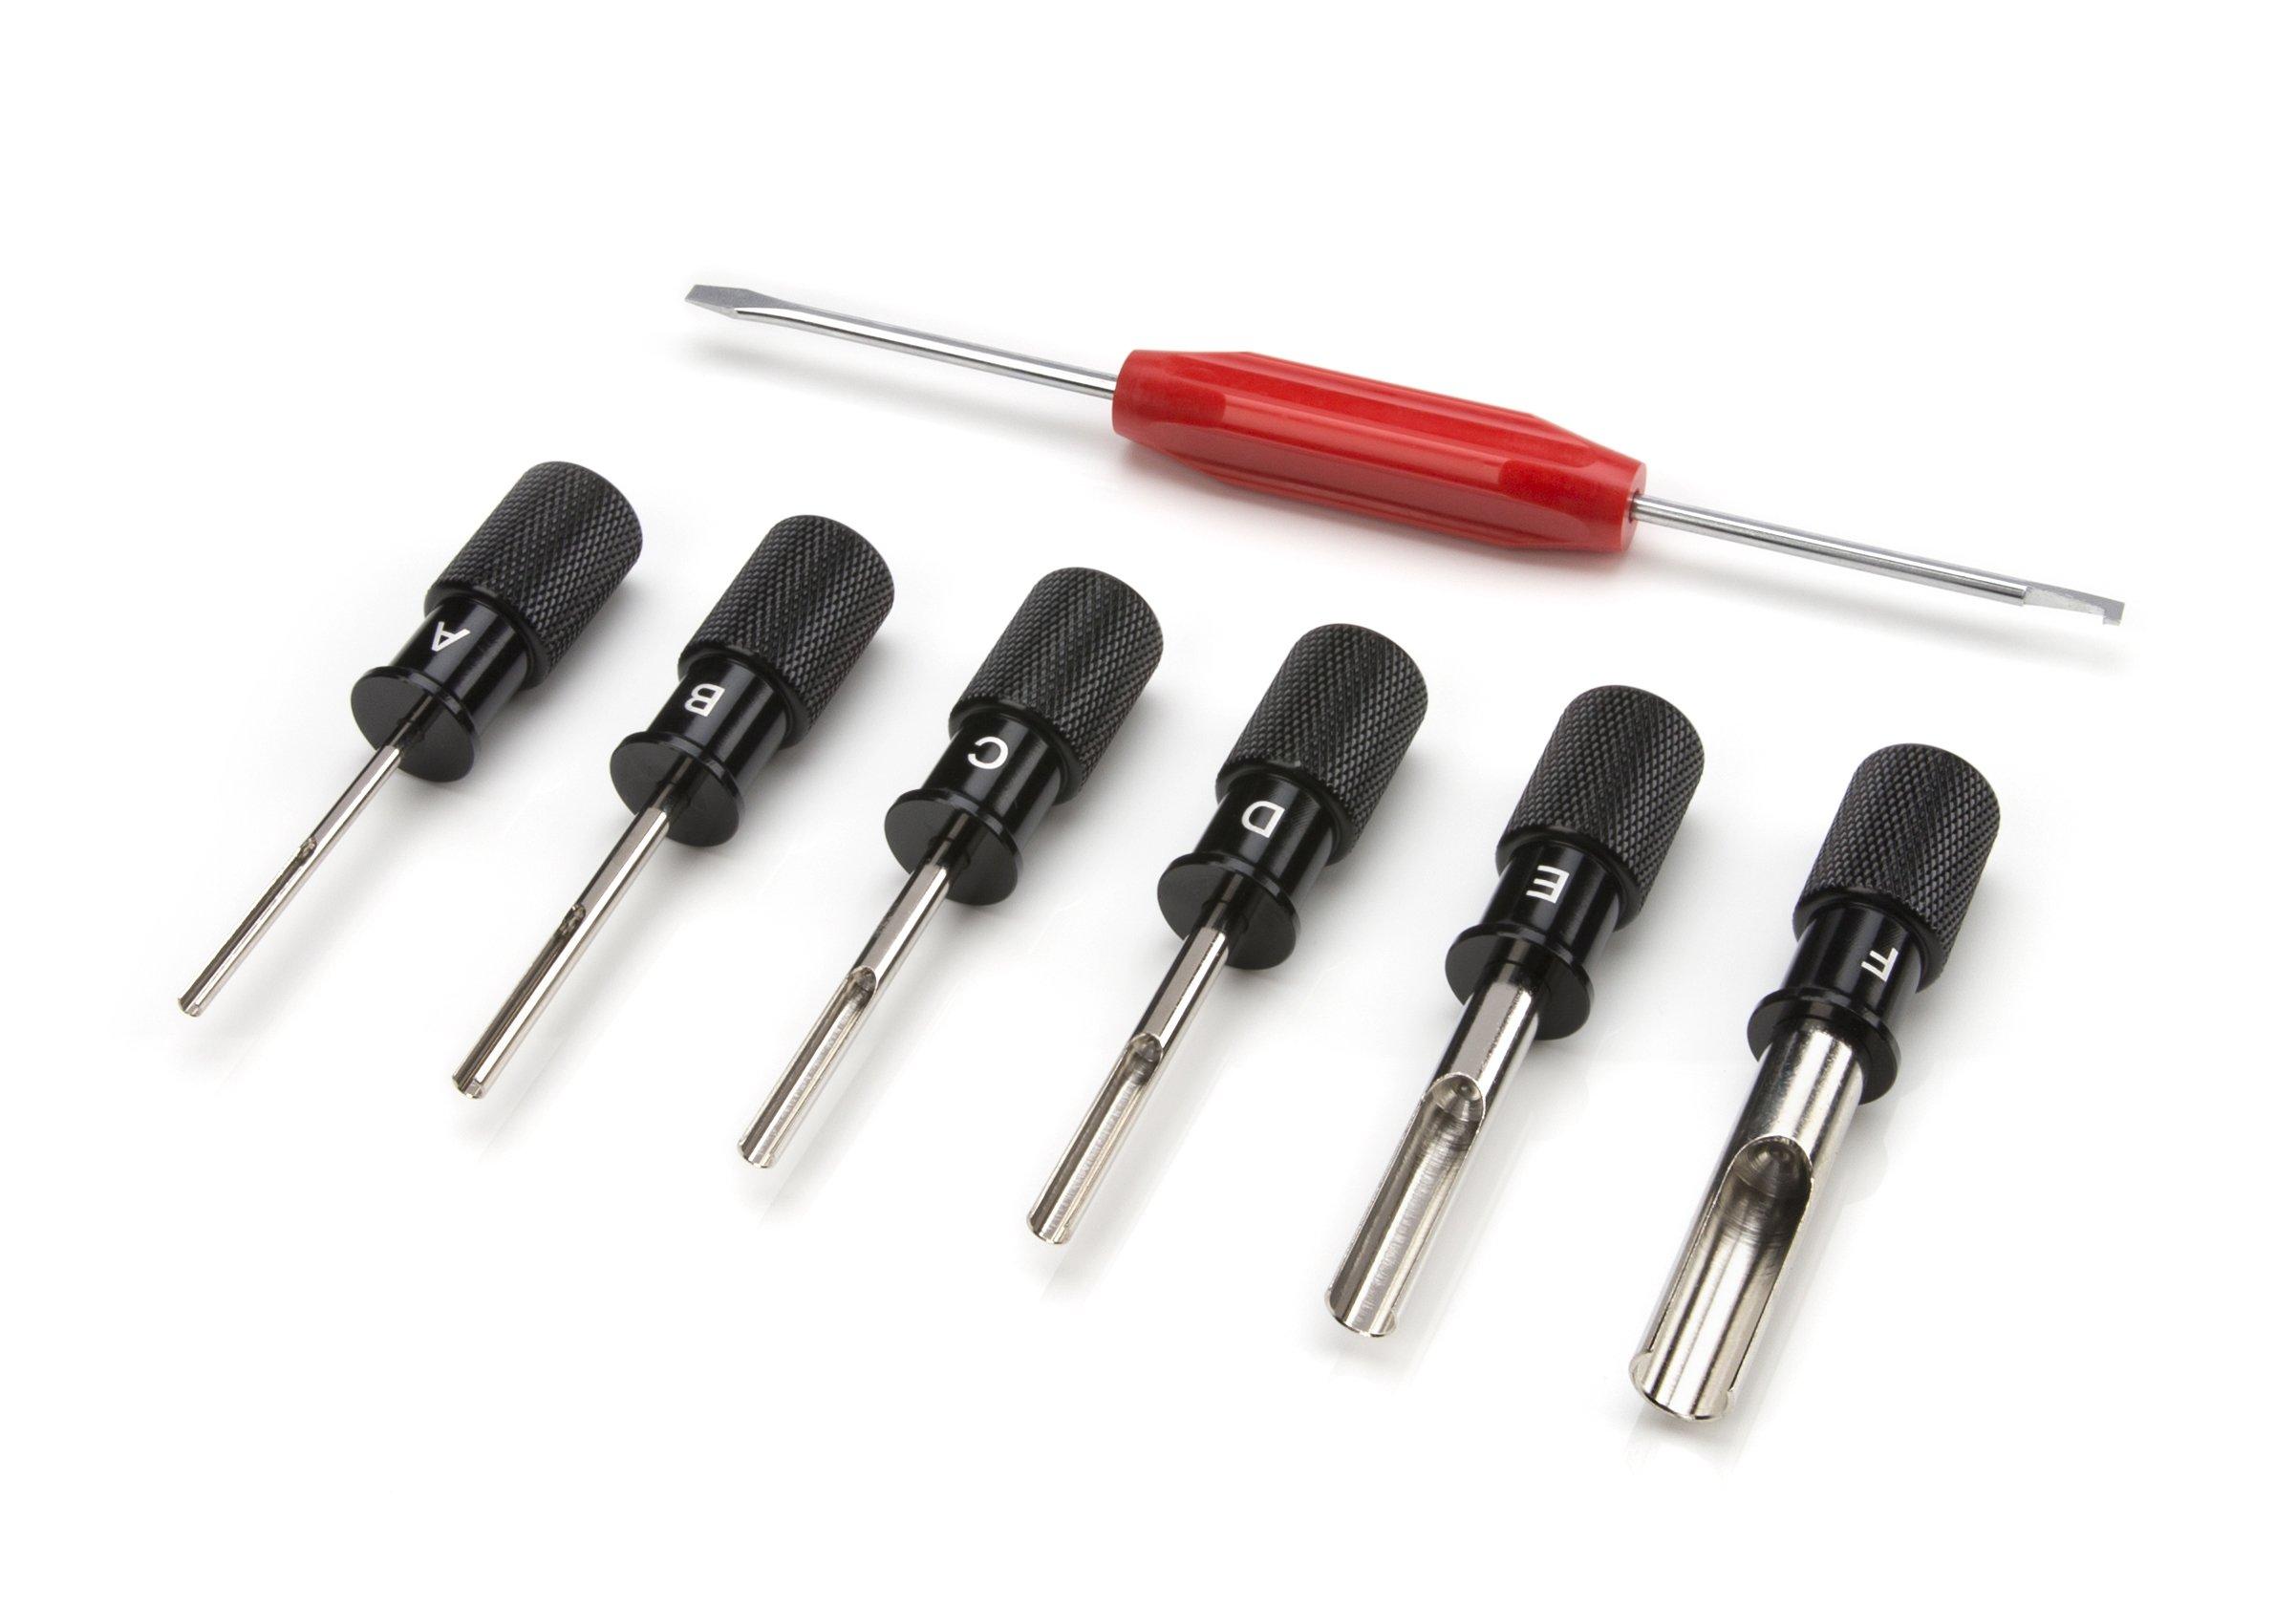 Steelman 95886 7-Piece Deutsch Terminal Tool Kit by Steelman (Image #2)